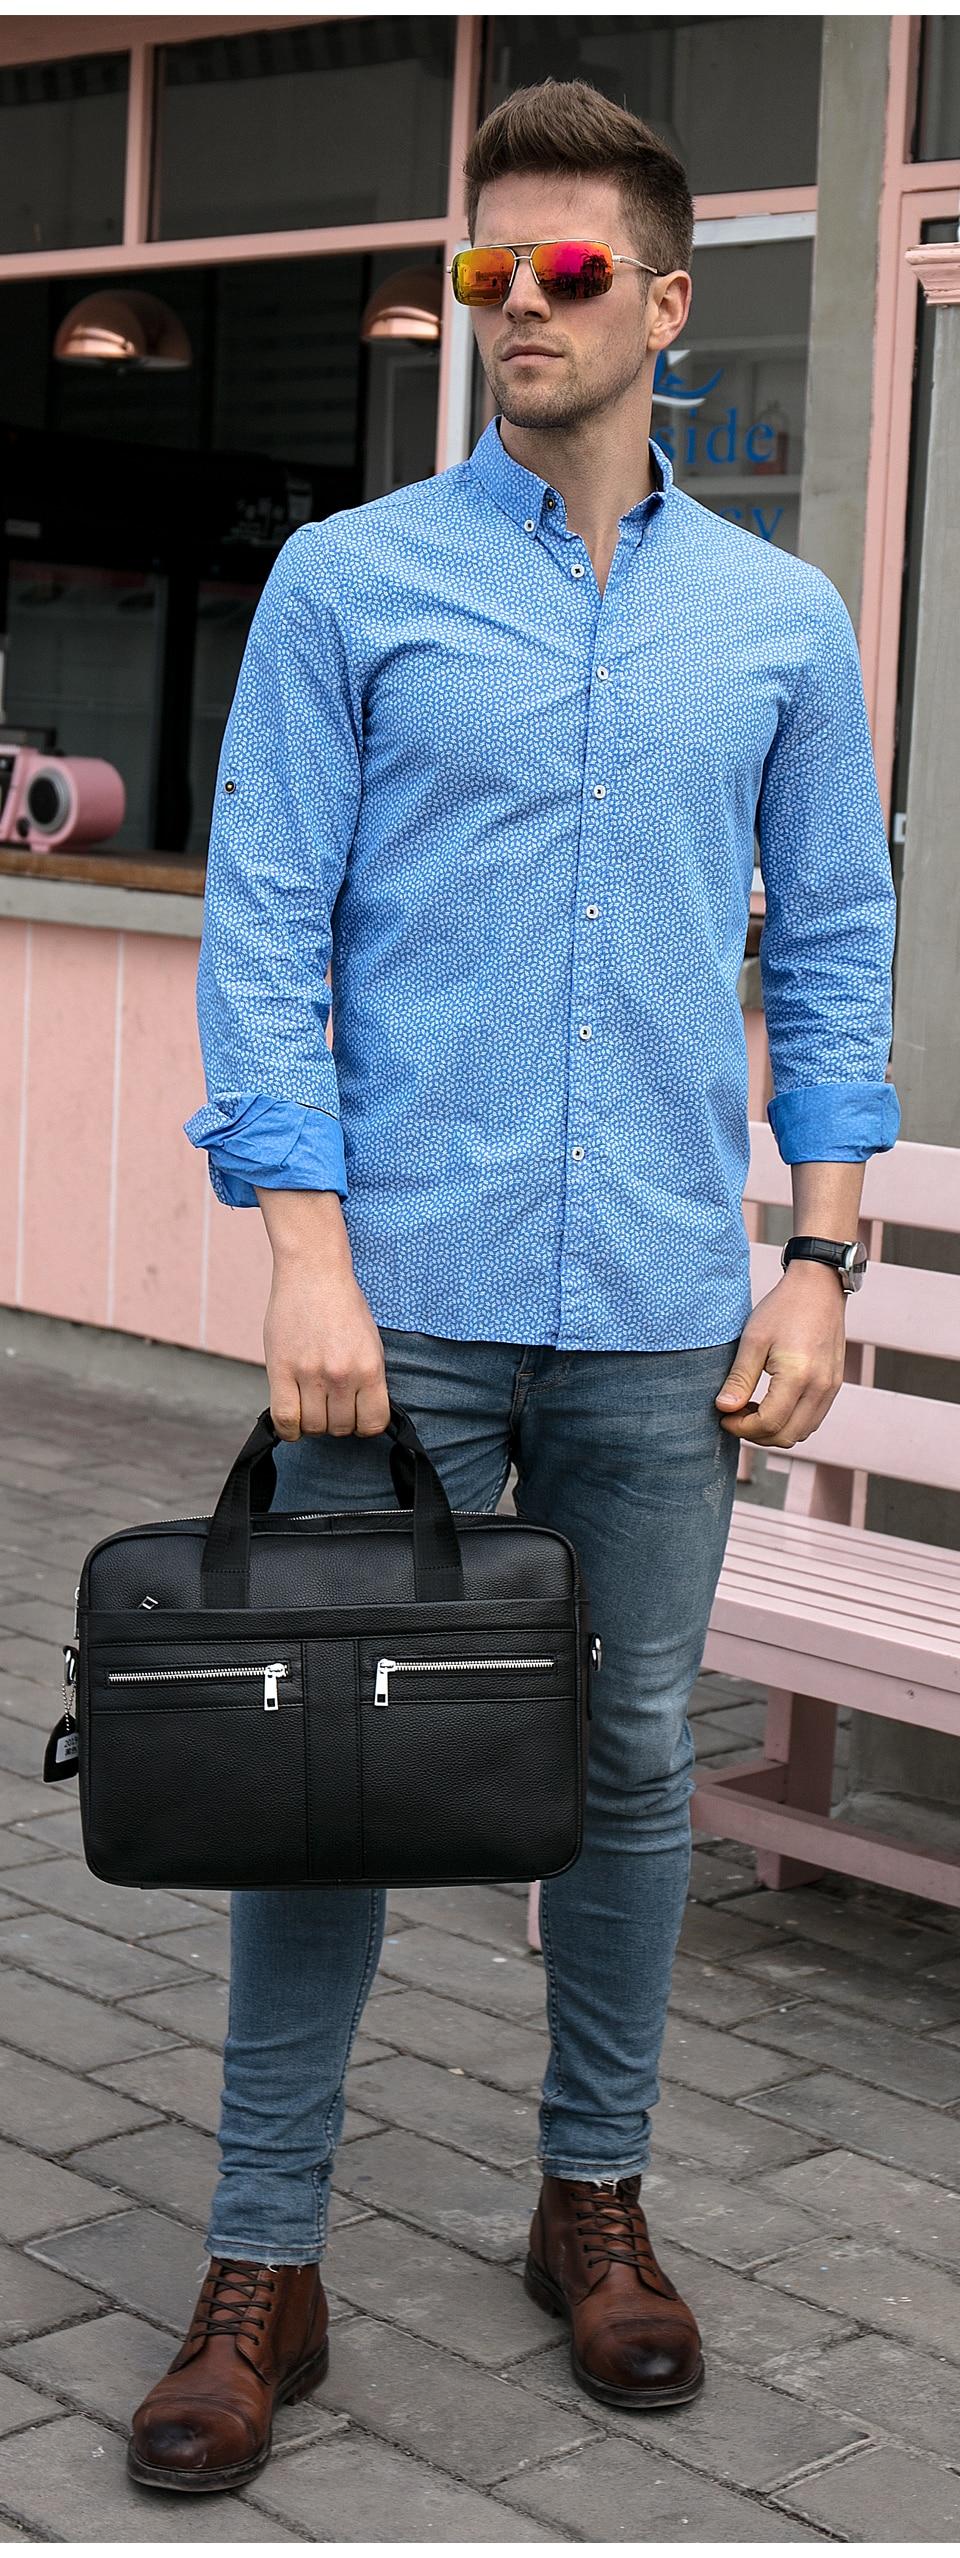 HTB1ZQT6aPzuK1Rjy0Fpq6yEpFXab WESTAL Bag men's Genuine Leather briefcase Male man laptop bag natural Leather for men Messenger bags men's briefcases 2019